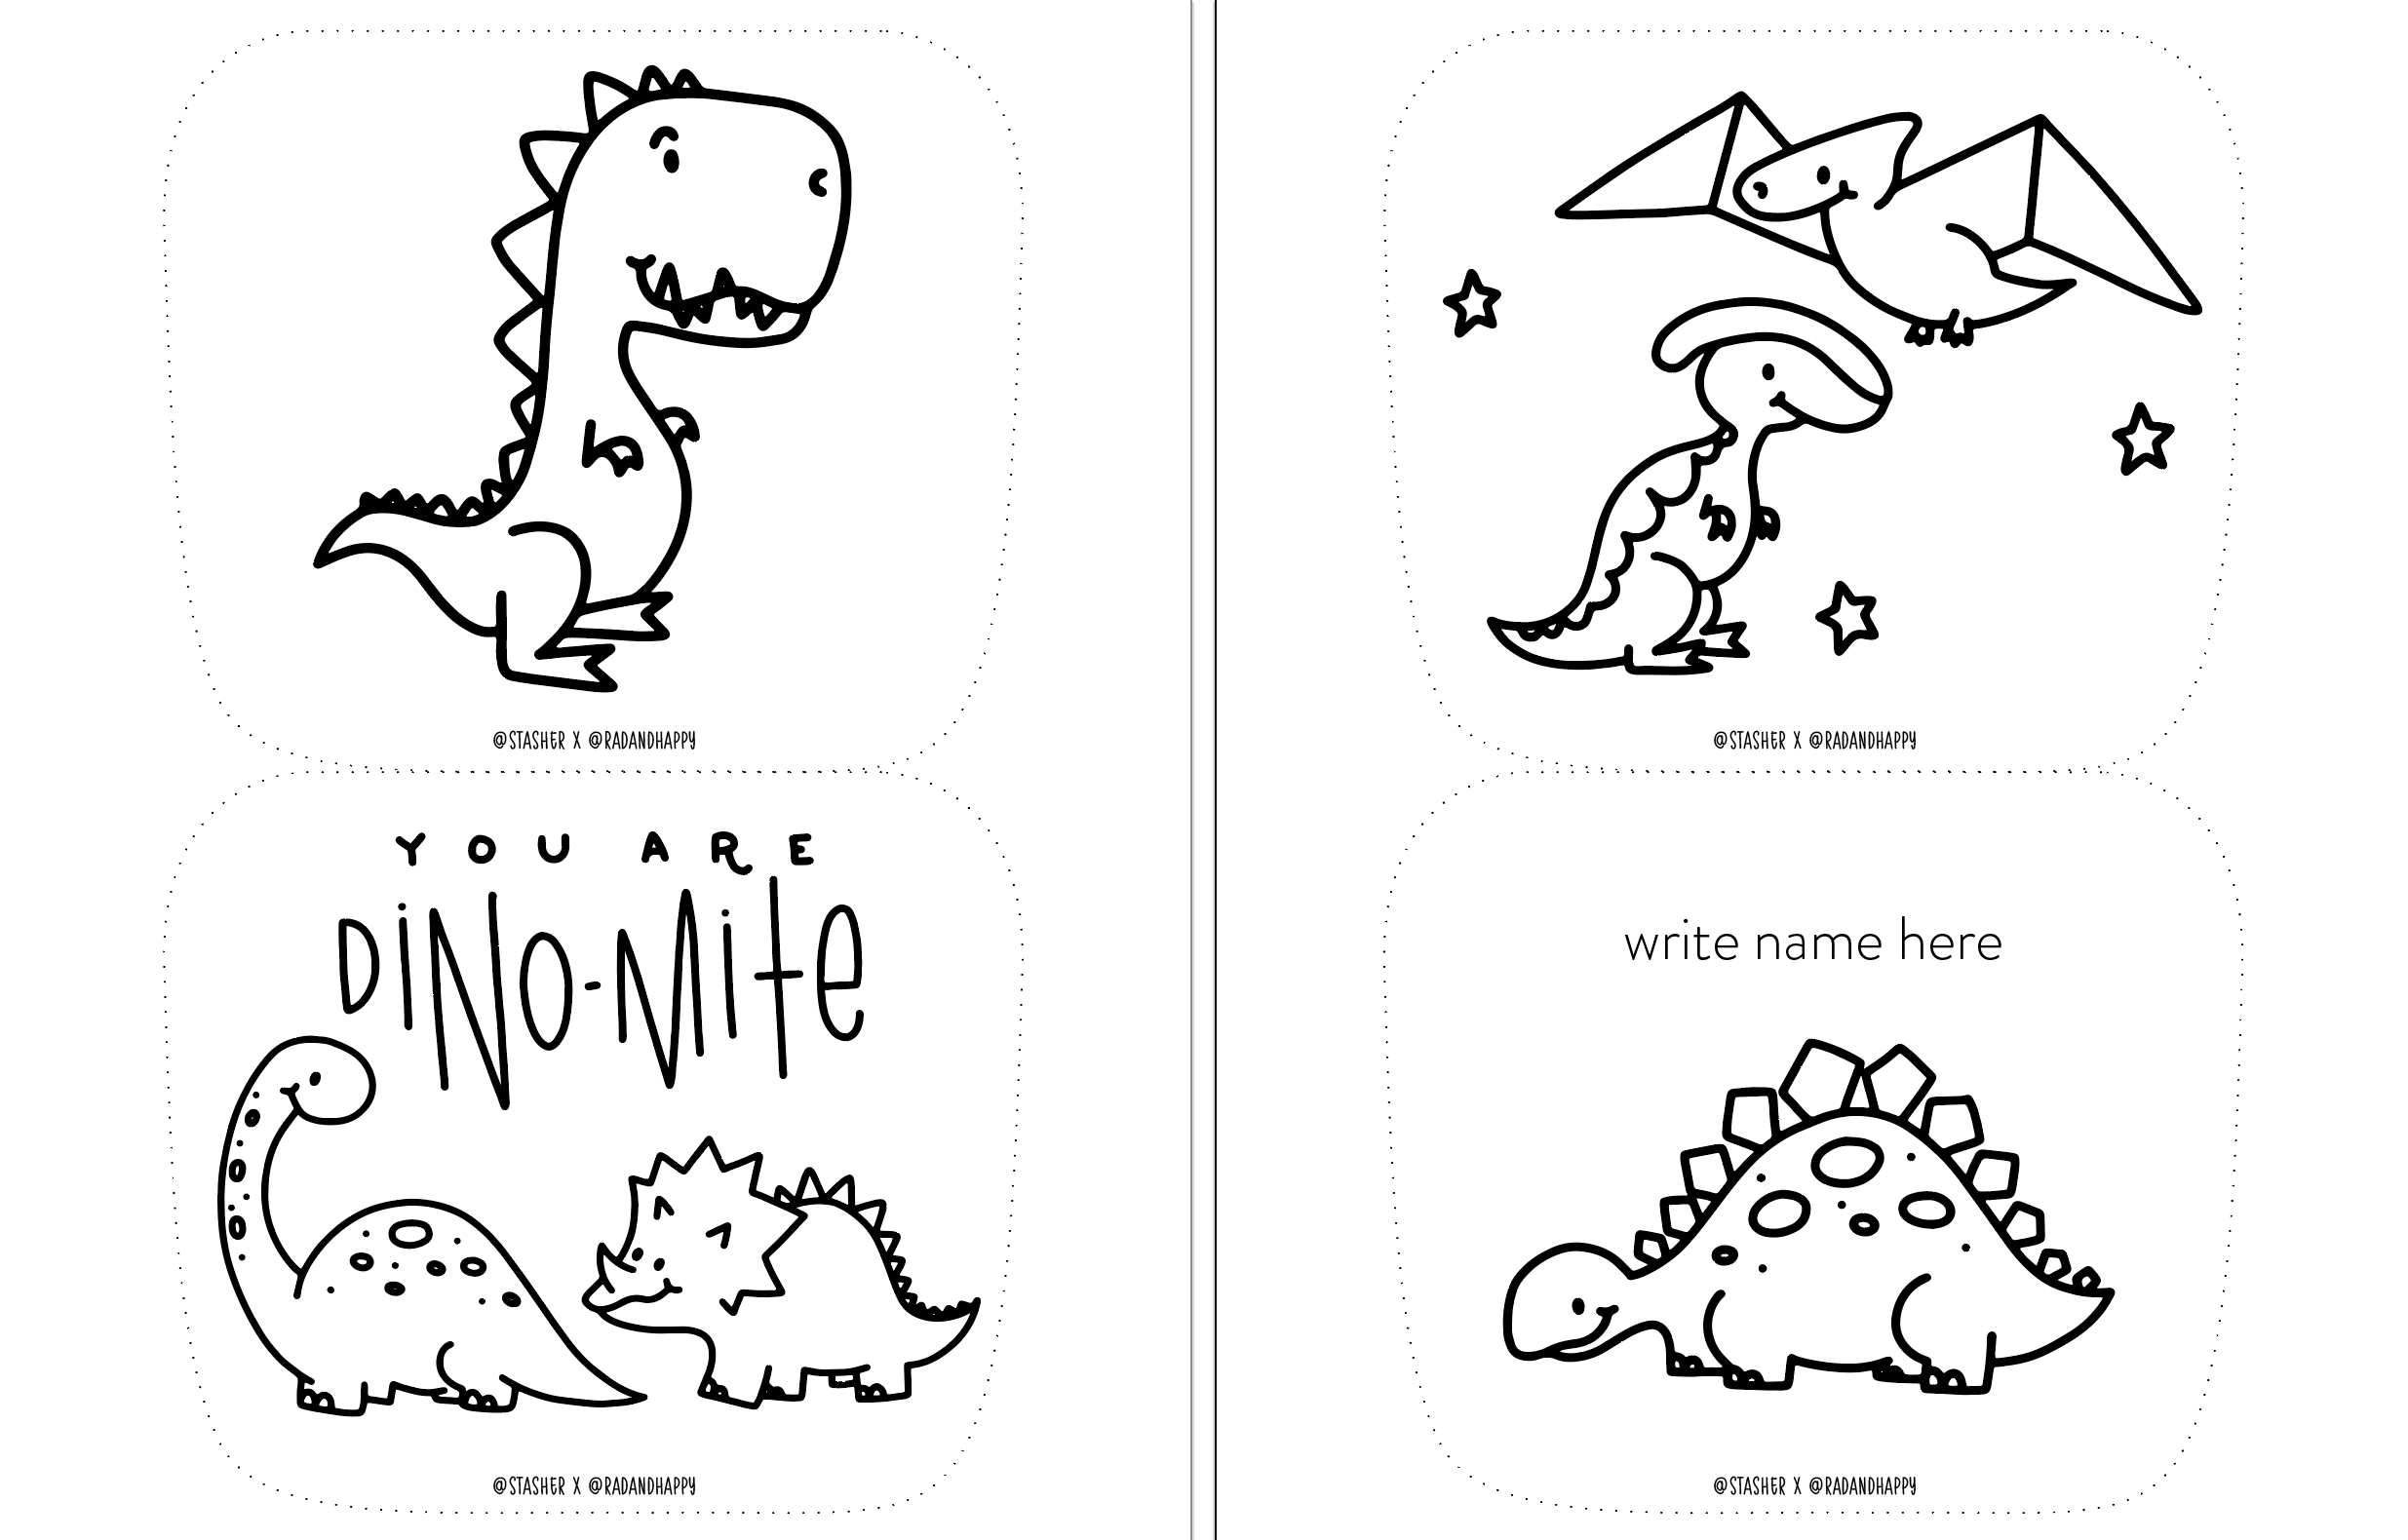 Https Cdn Shopify Com S Files 1 2237 5935 Files Dinosaur Stencils Png V 1601309976 Teaching Preschool Child Life Dinosaur Stencil [ 1580 x 2470 Pixel ]